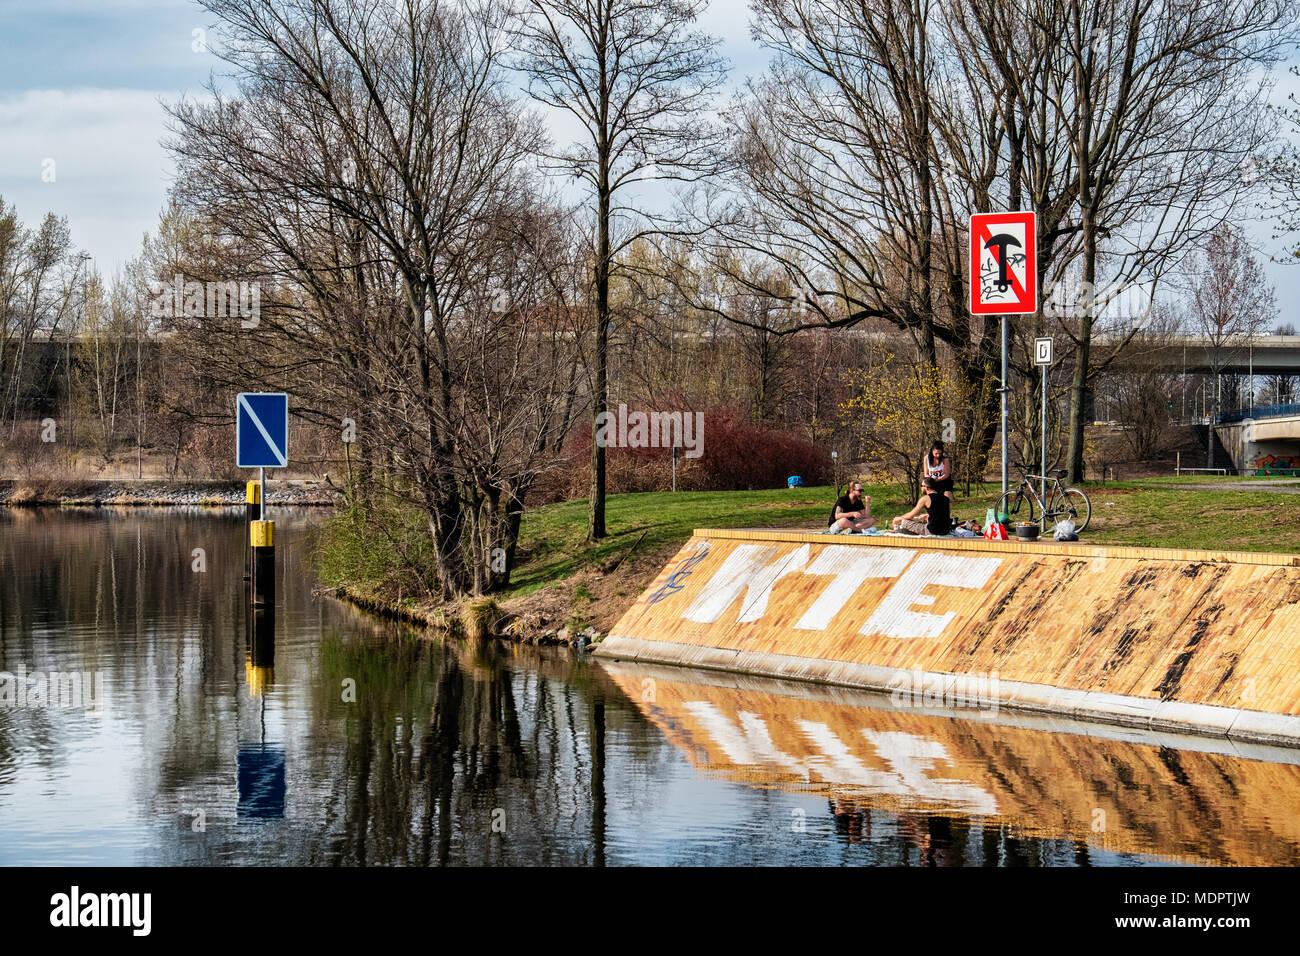 Berlin Charlottenburg-Wilmersdorf, Three young people picnic in park next to Schleusenkanal n Spring - Stock Image